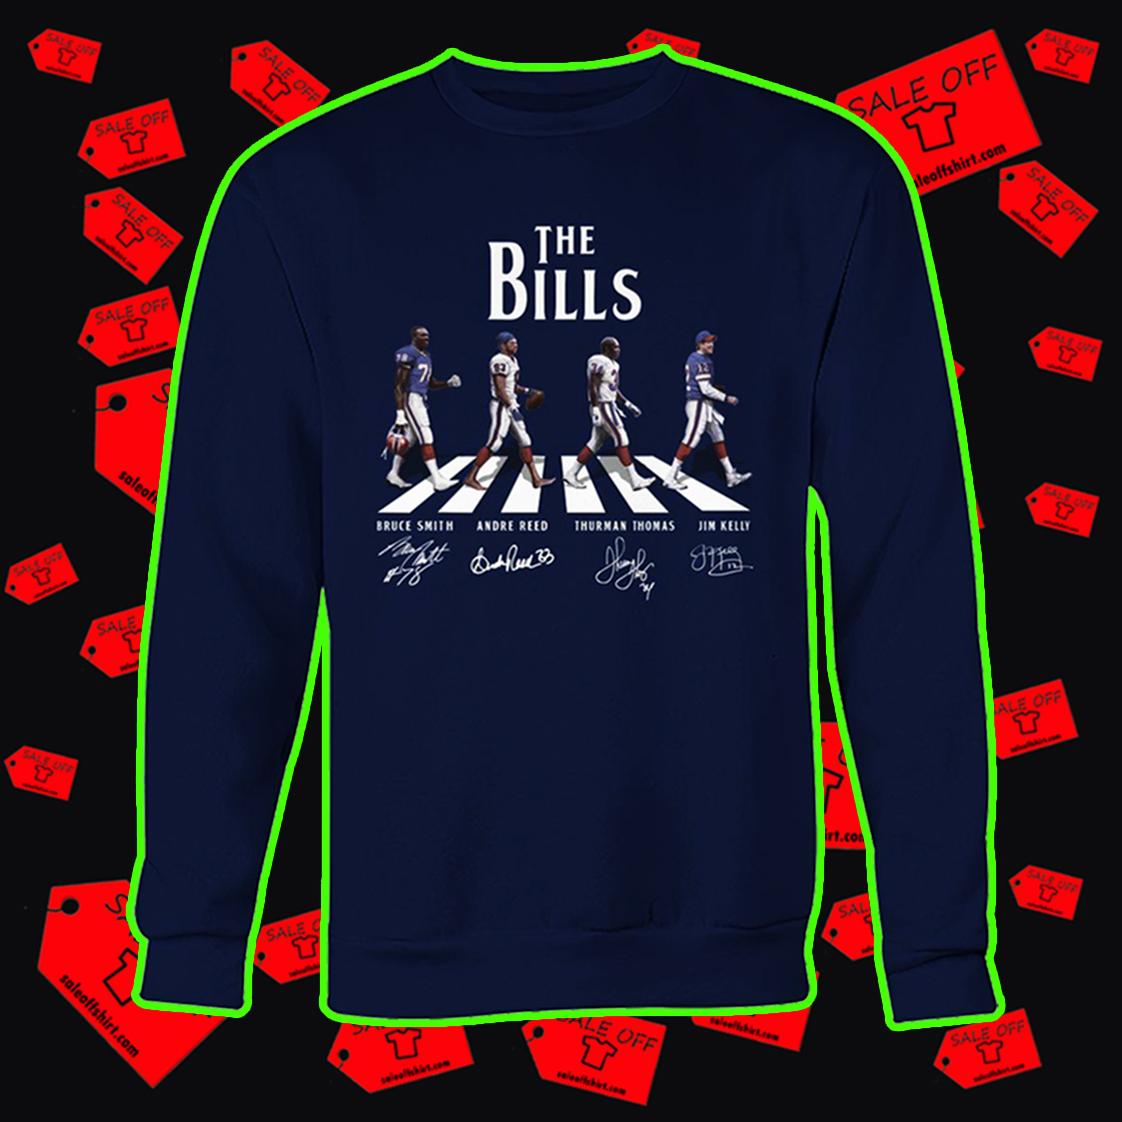 The Bills Abbey Road sweatshirt